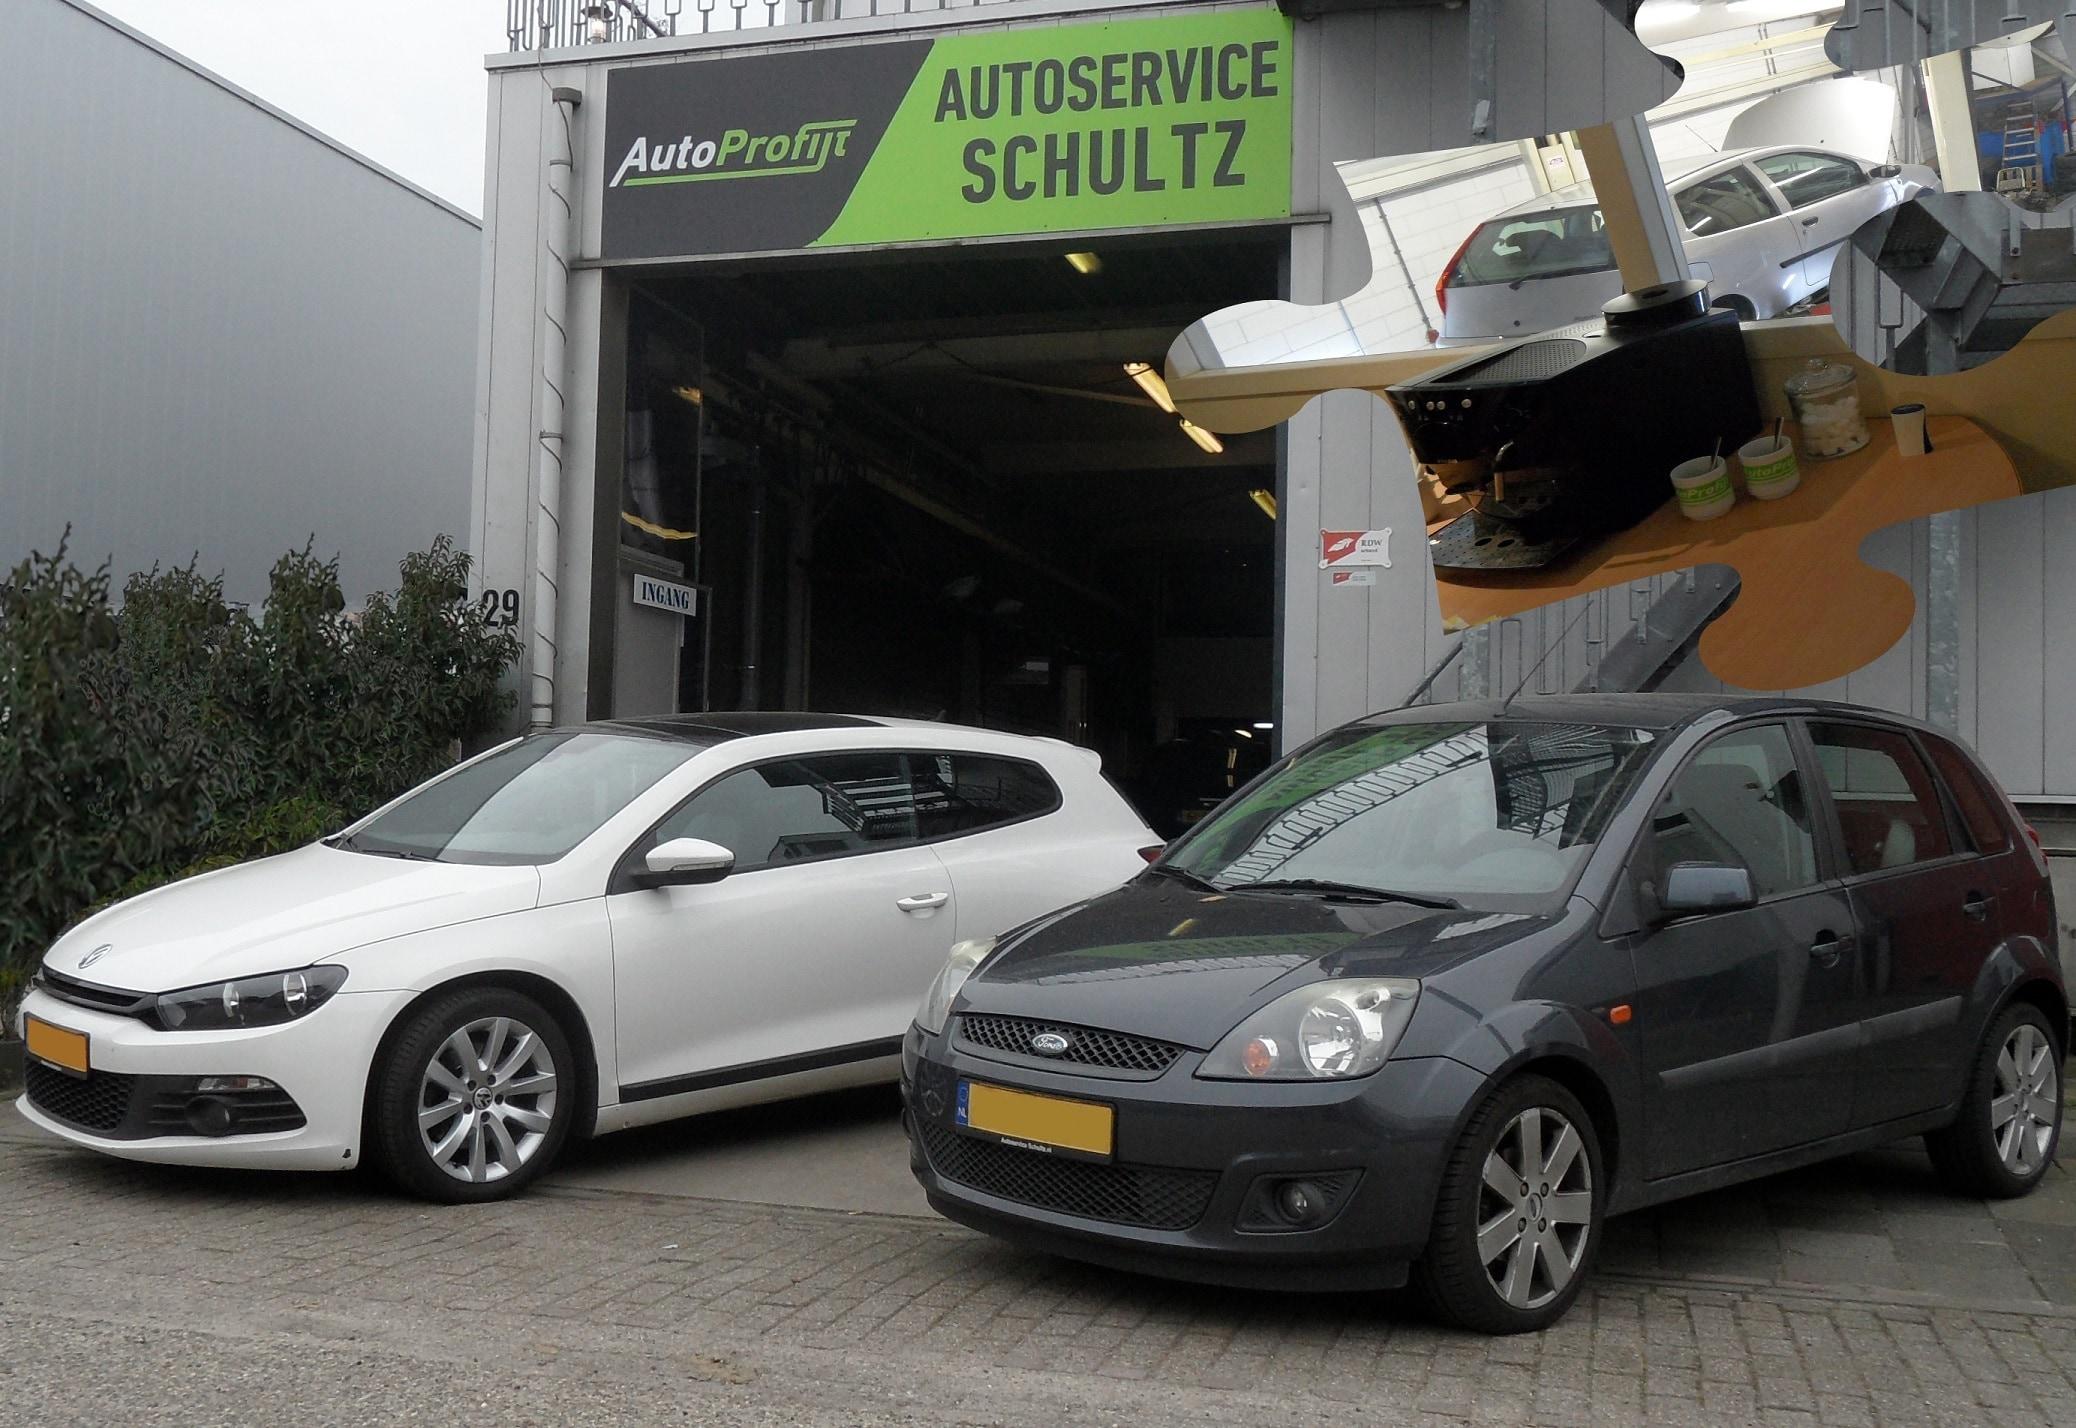 Autoservice Schultz